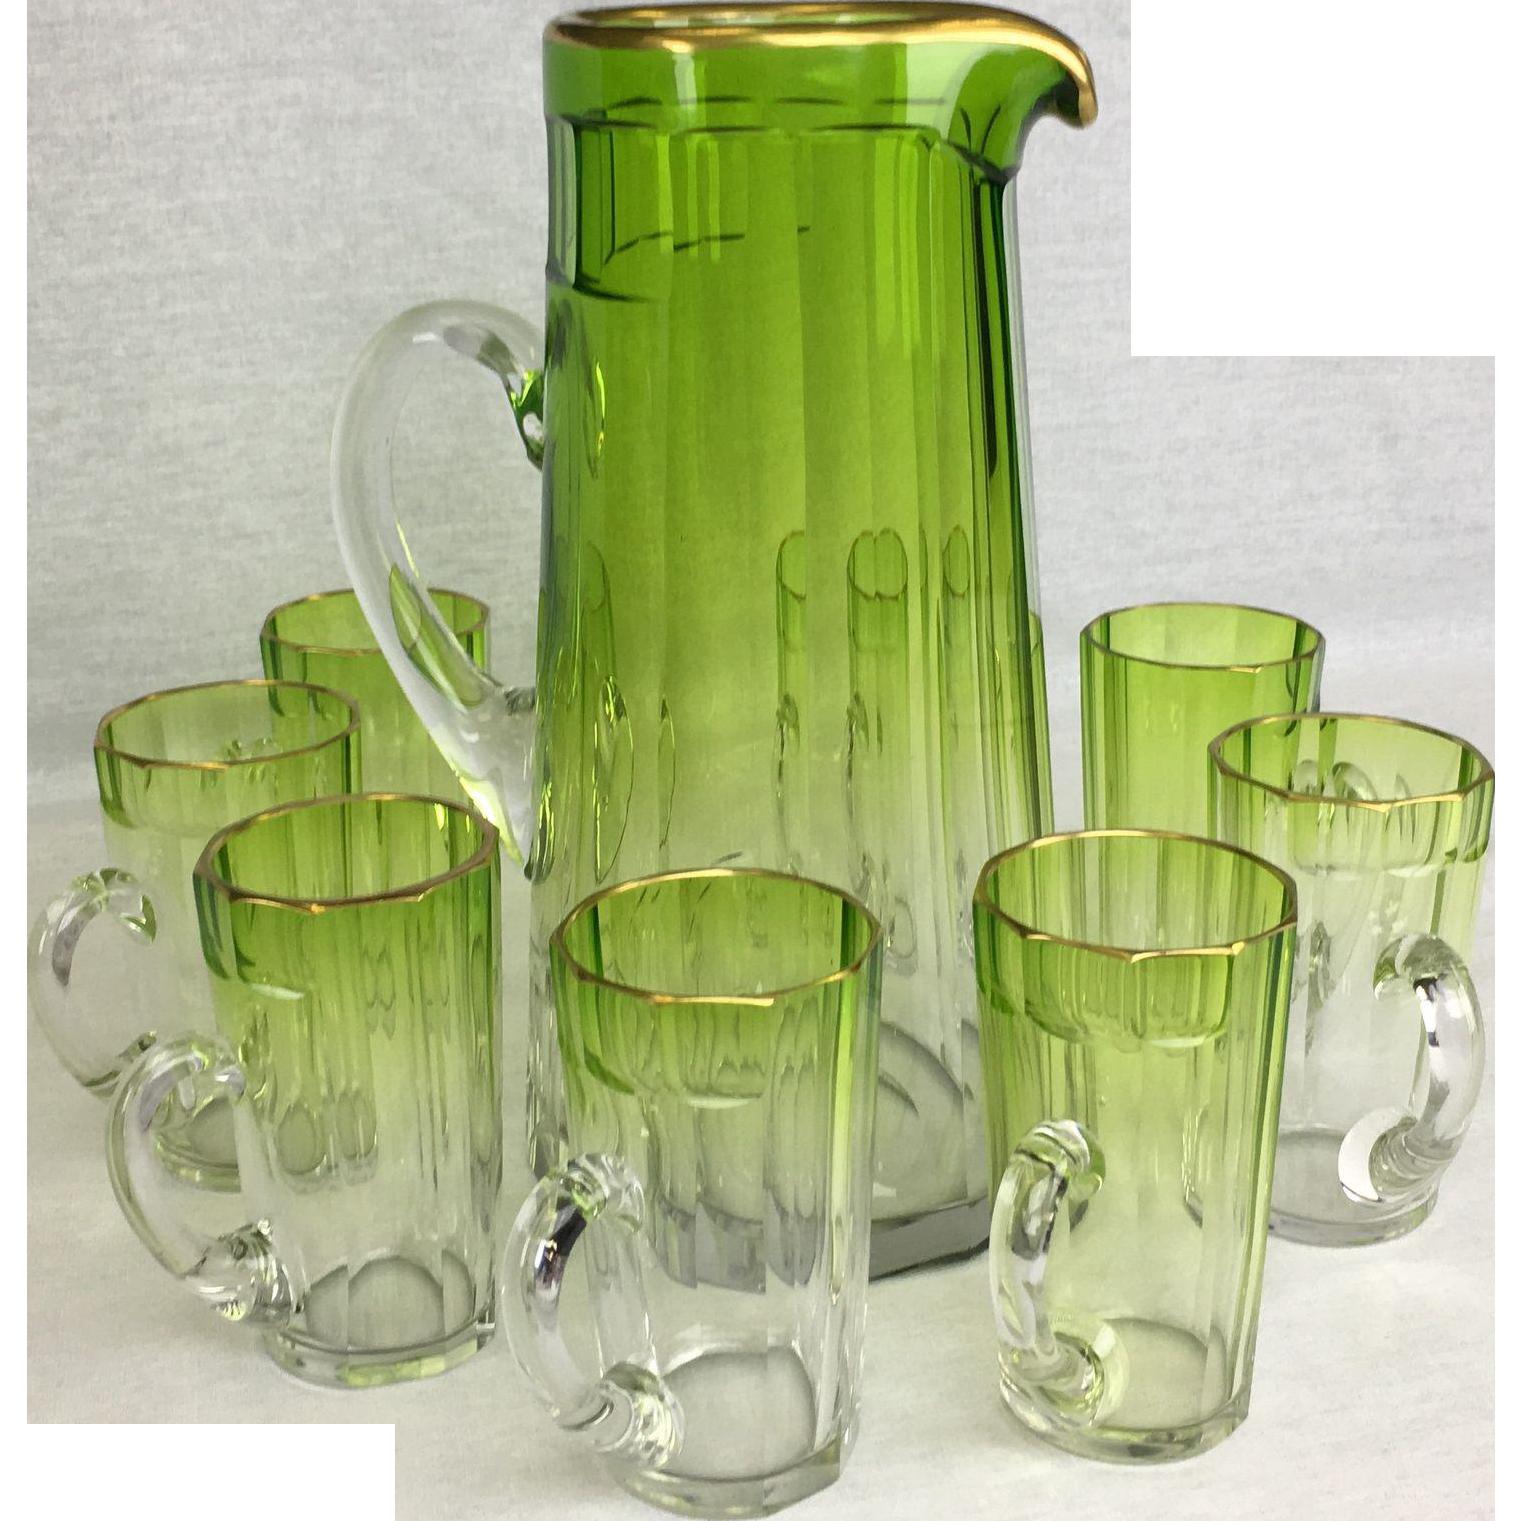 Moser Green Uranium Glass Gilt Edged Lemonade or Water Set